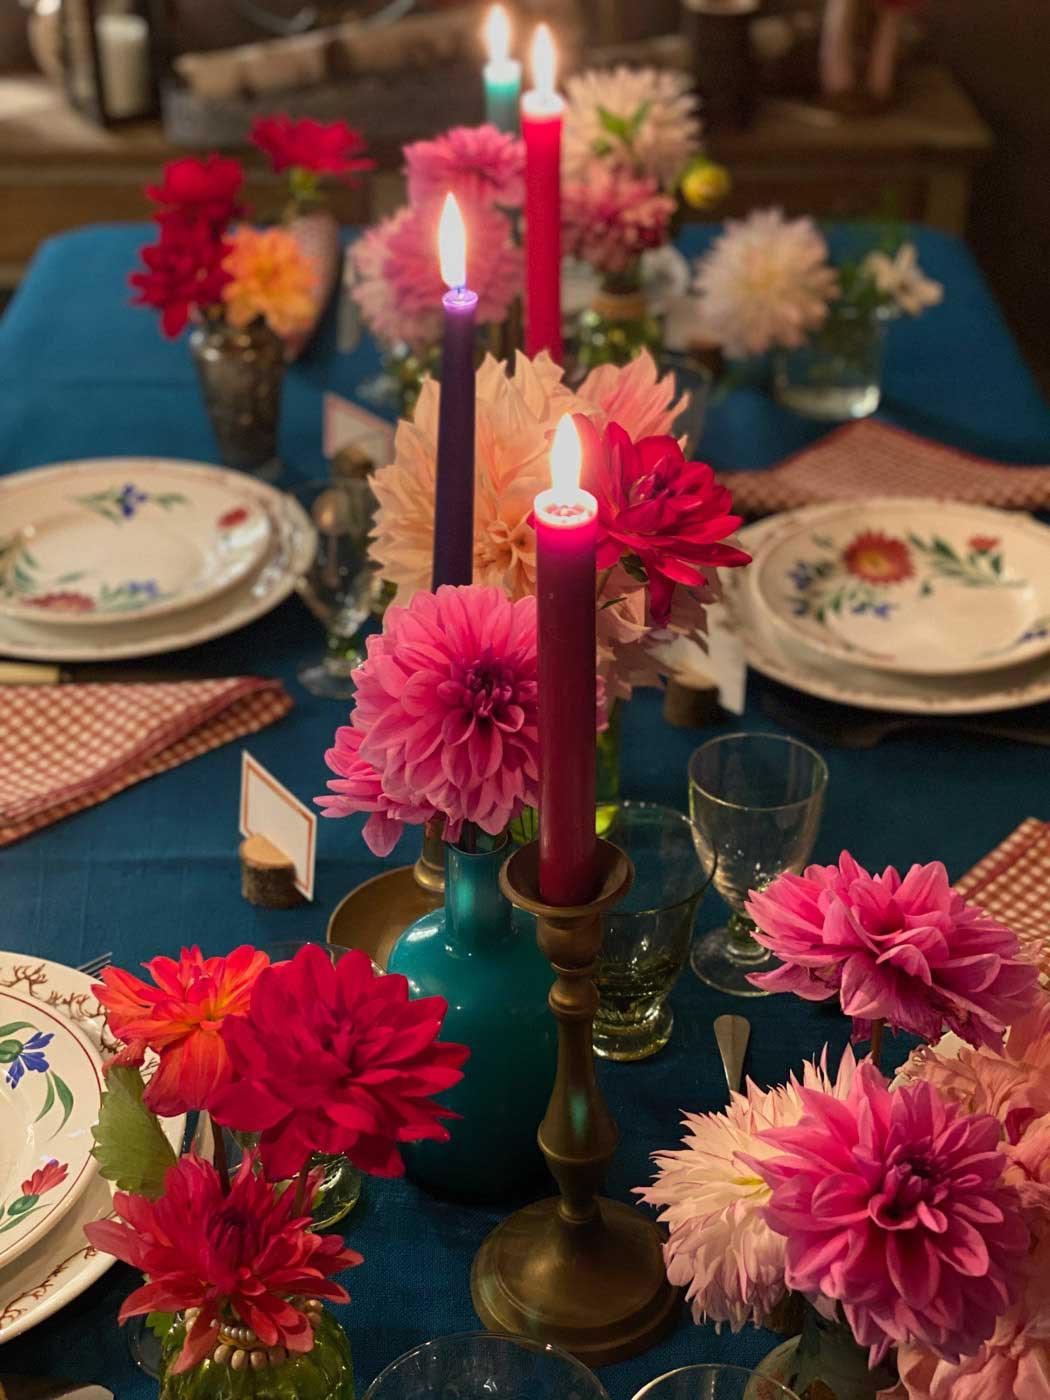 dresser-table-art-dahlias-tablescape-how-to-set-table-vt-33